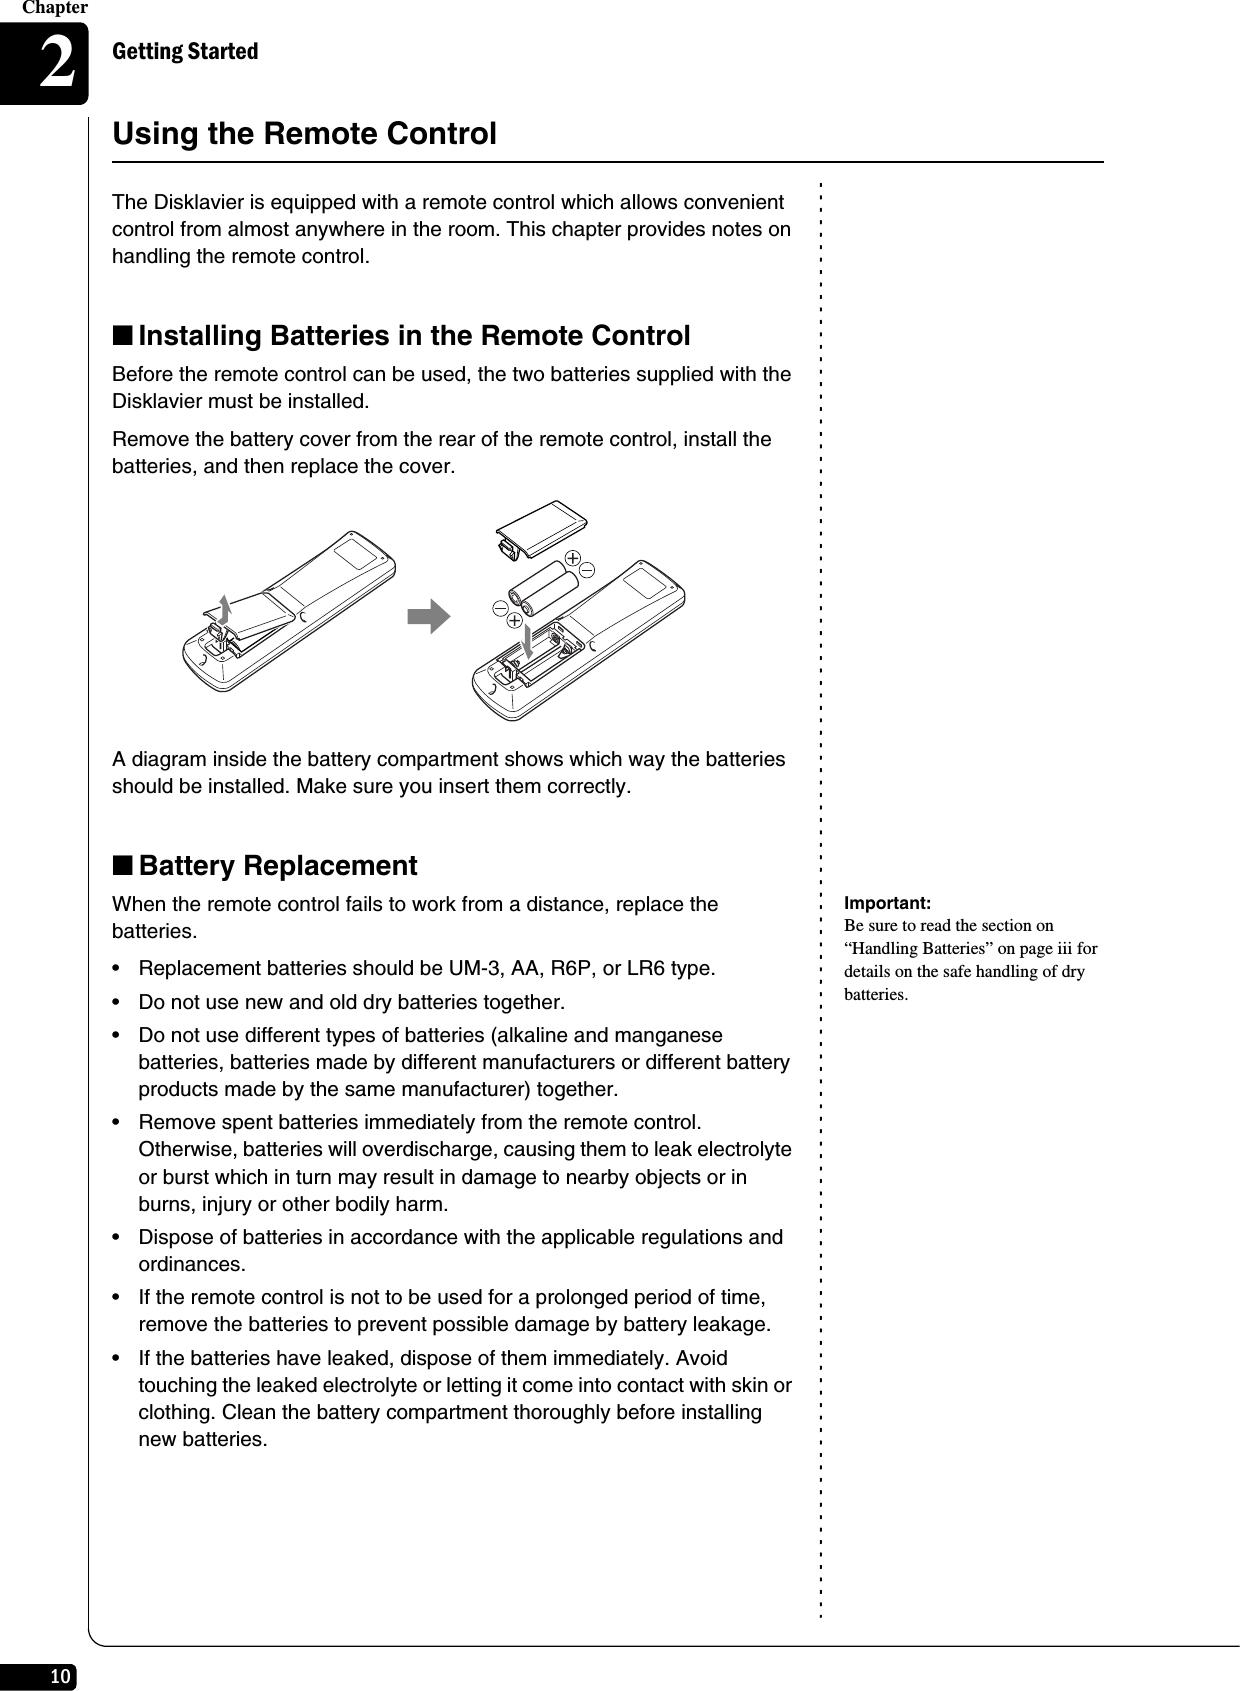 Yamaha Disklavier E3 Operation Manual (Asia & Pacific) Dkve3